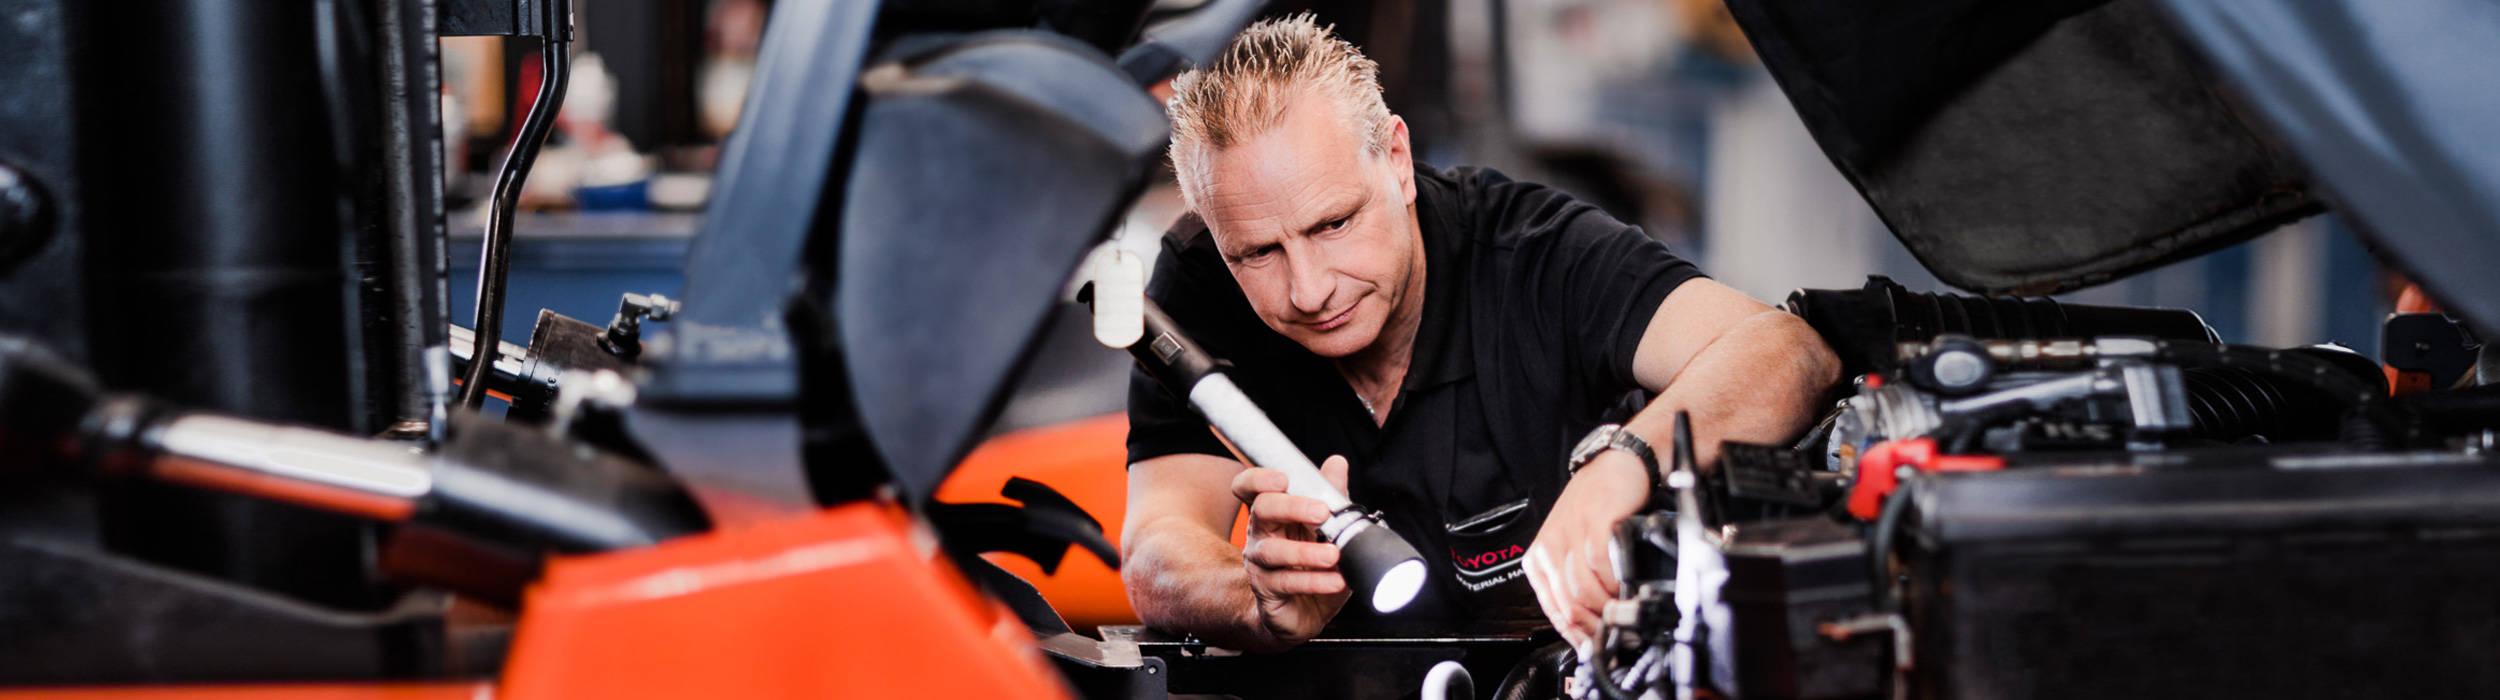 Serviceeftersyn af Toyota gaffeltruck